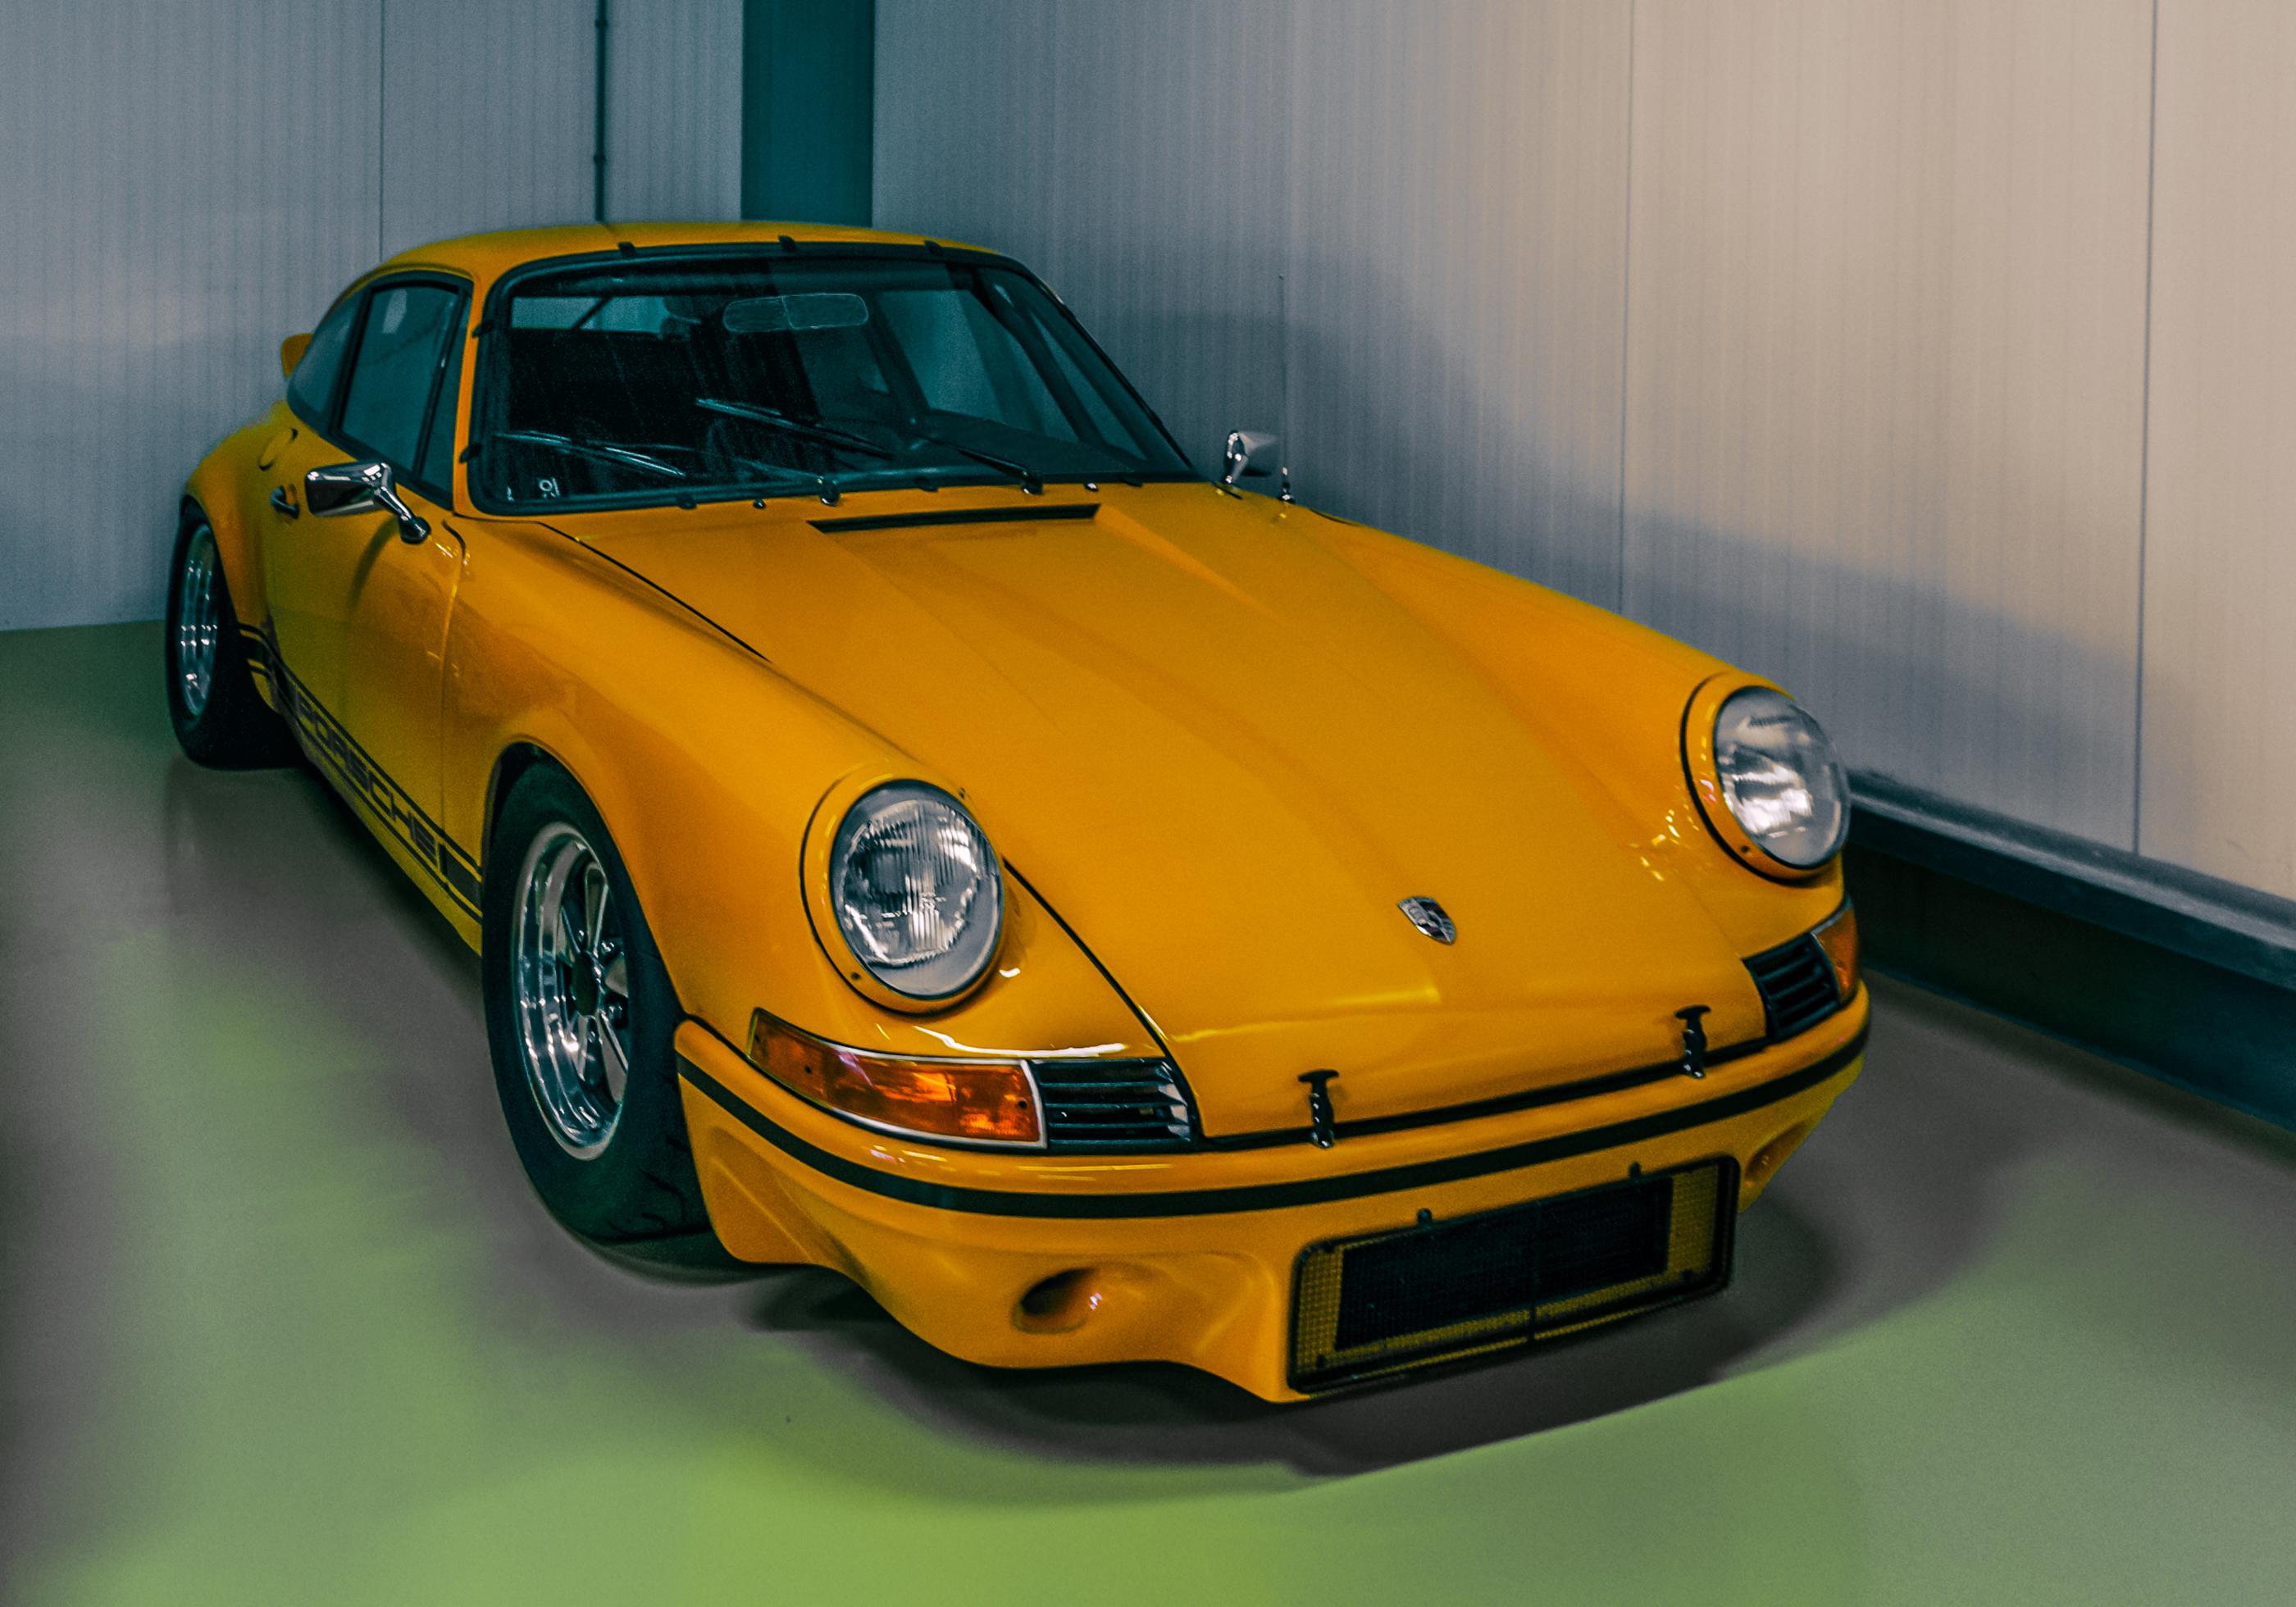 Wallpaper : Old, Model, Sport, Germany, Historic, Orange, Nikon, Vintage, Europe, Porsche 911